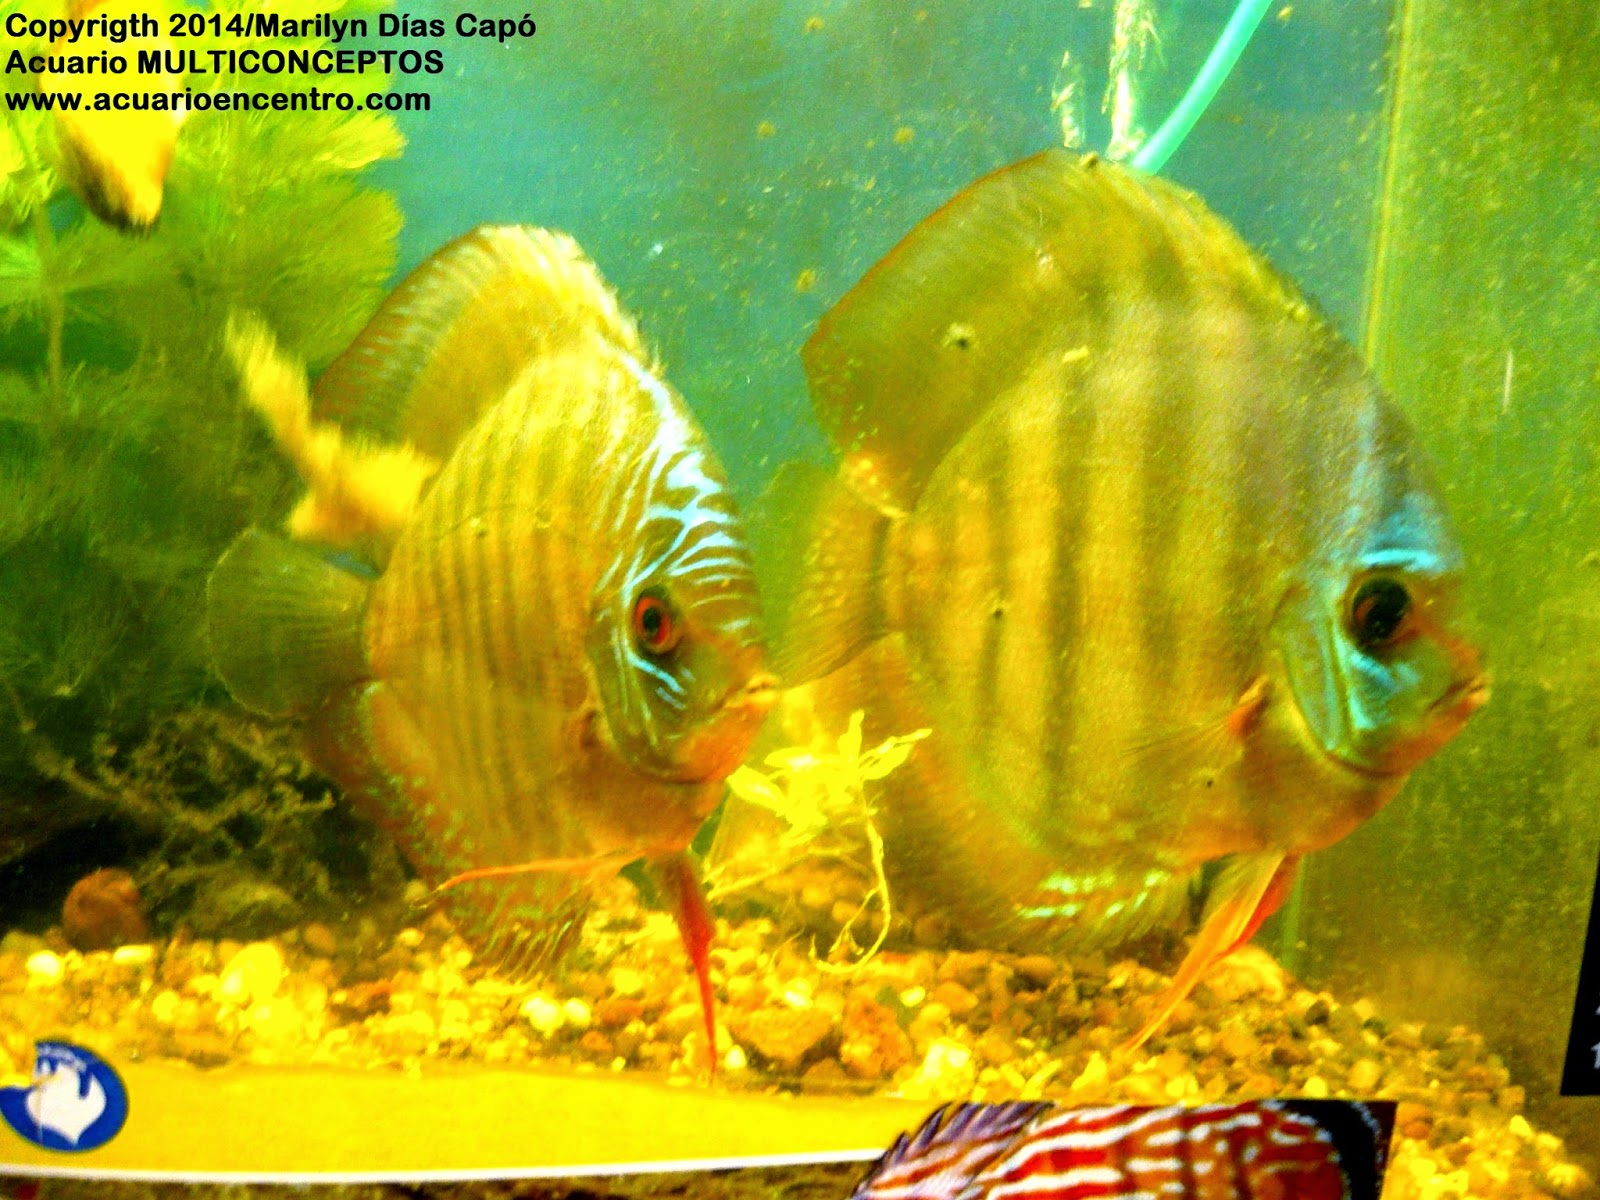 Peces tropicales de agua dulce 02 05 15 for Criadero de peces de colores